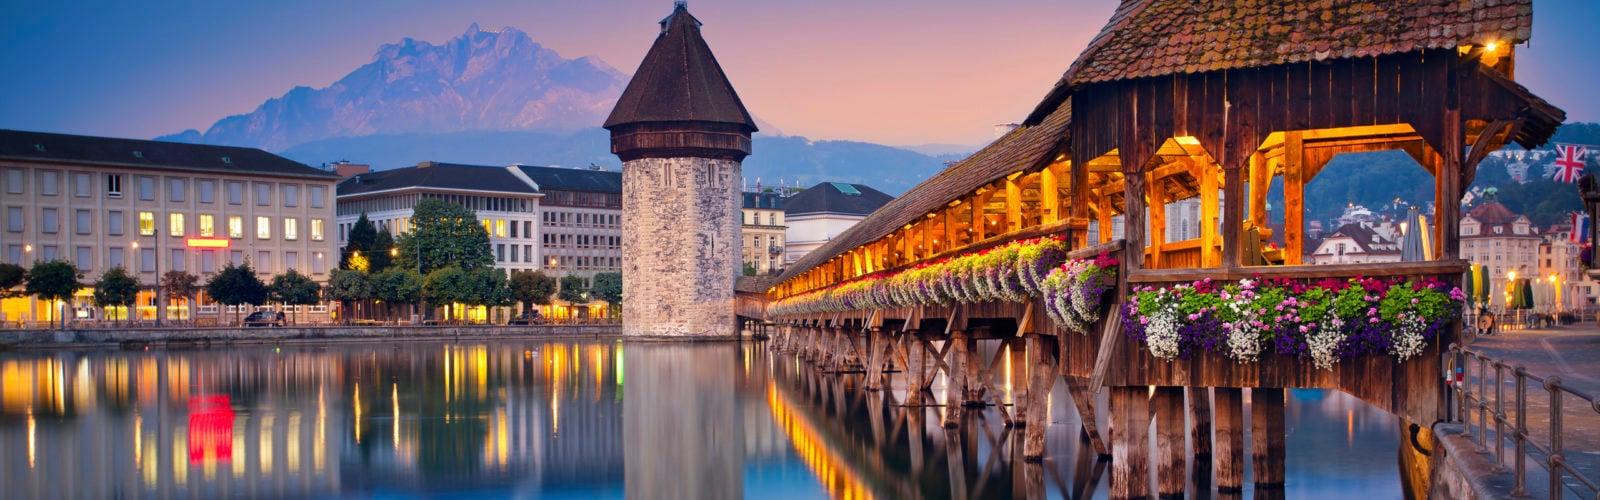 lake-lucerne-chapel-bridge-night